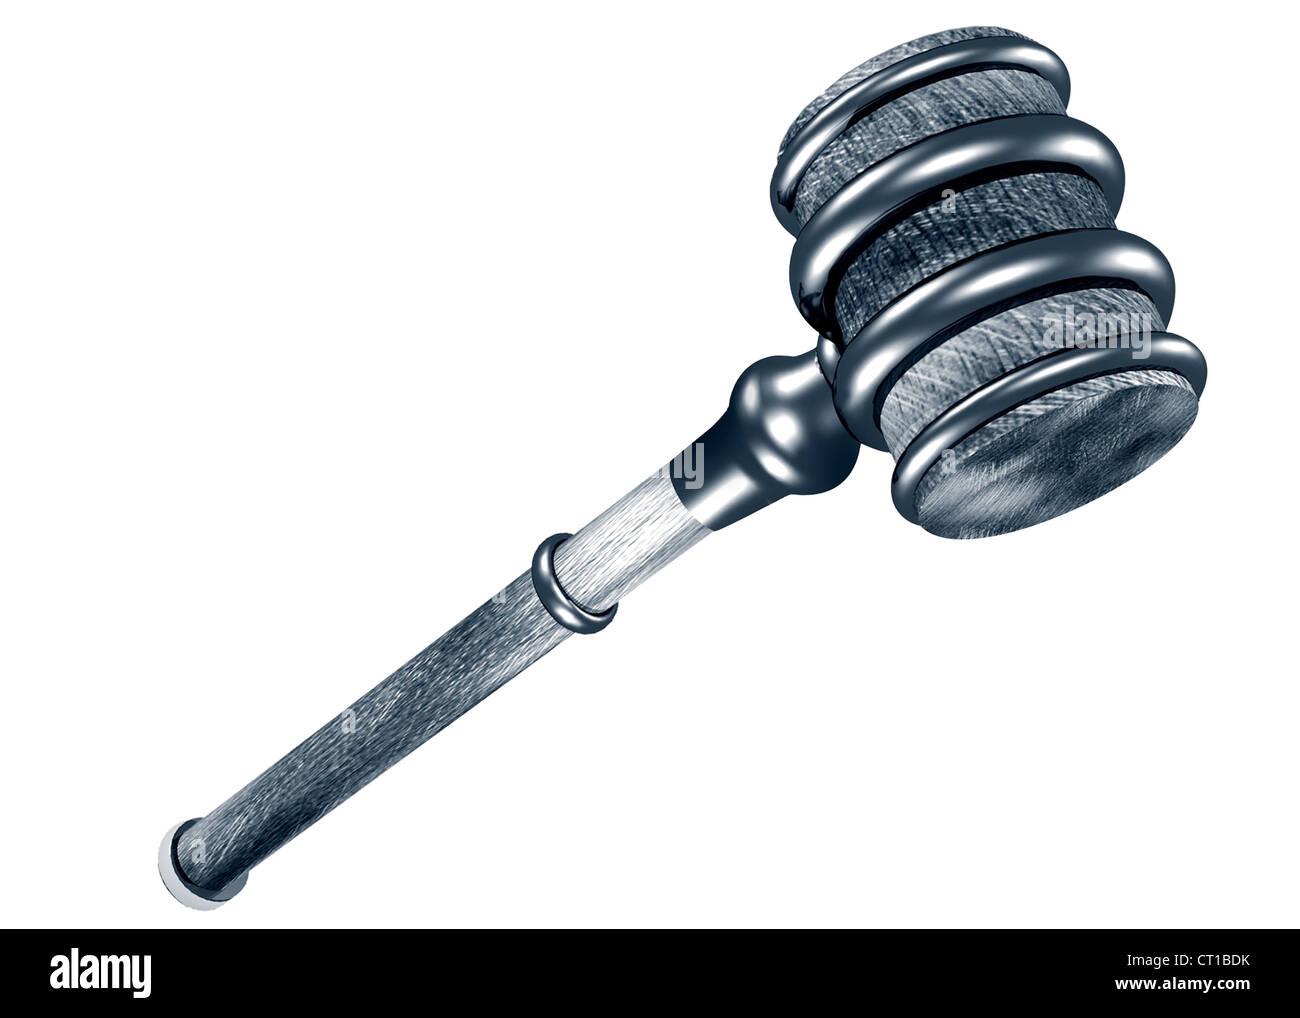 auction hammer or gavel on white background - Stock Image